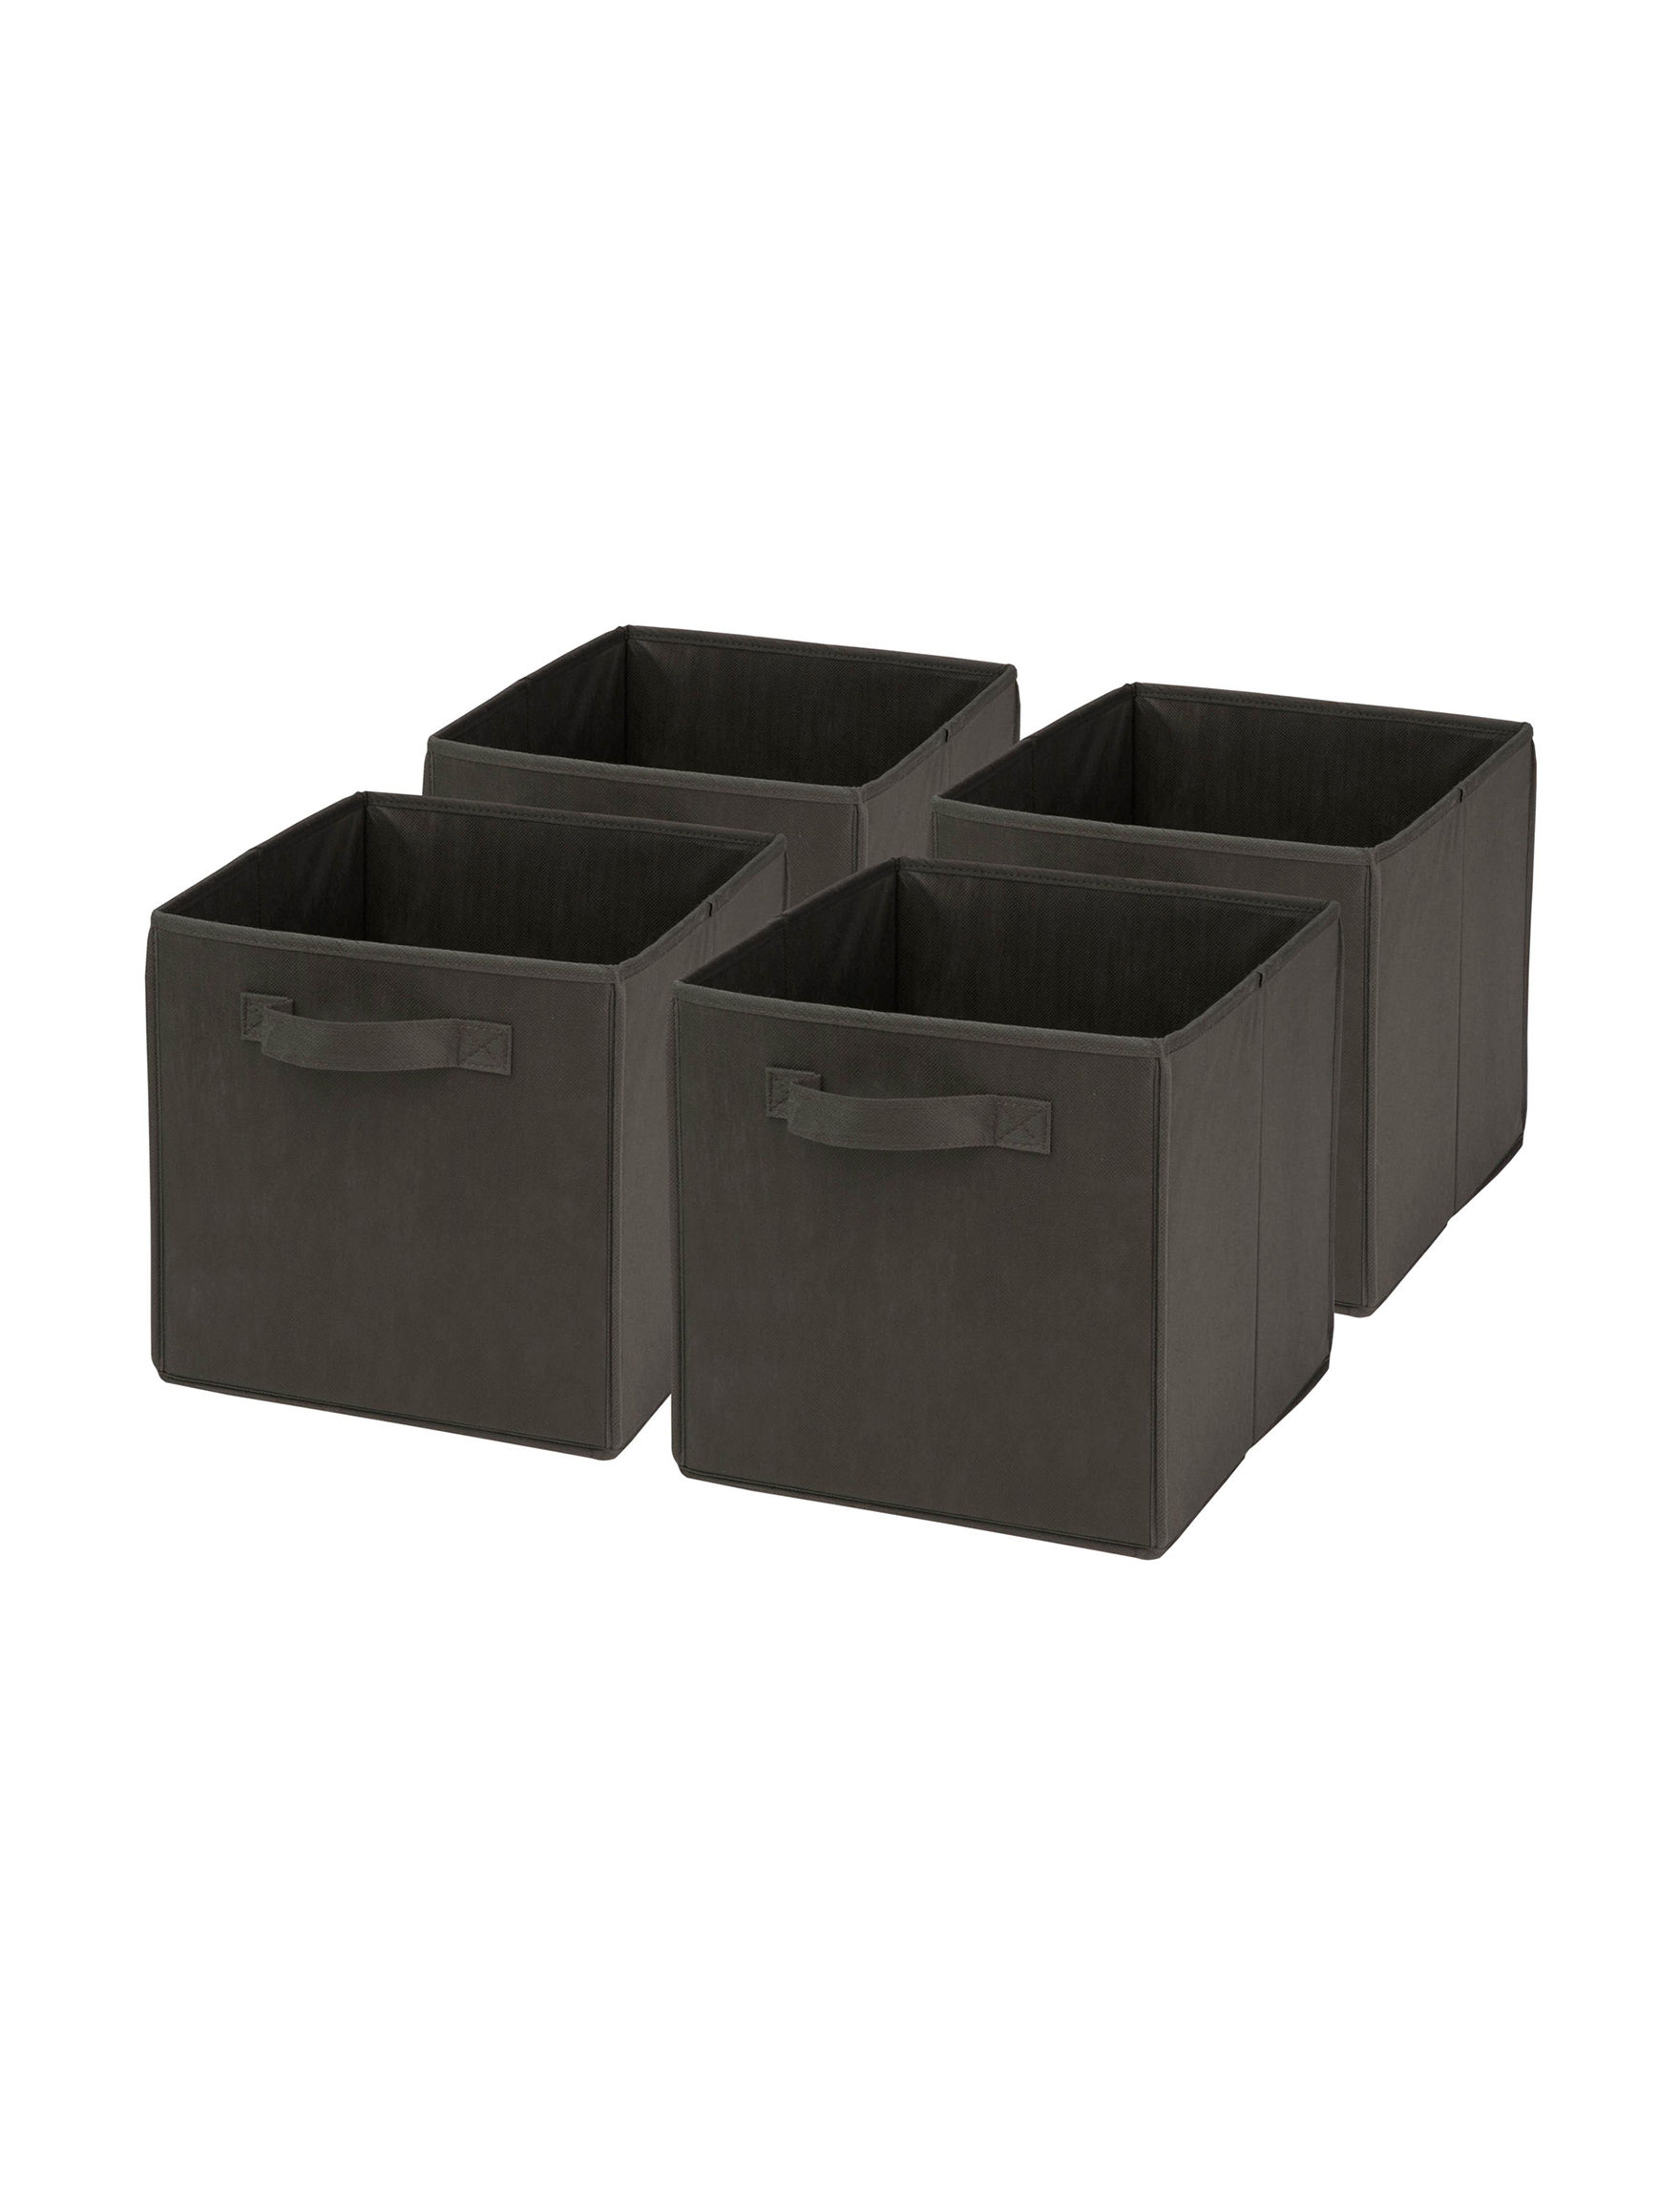 Honey-Can-Do International Black Storage Bags & Boxes Storage & Organization